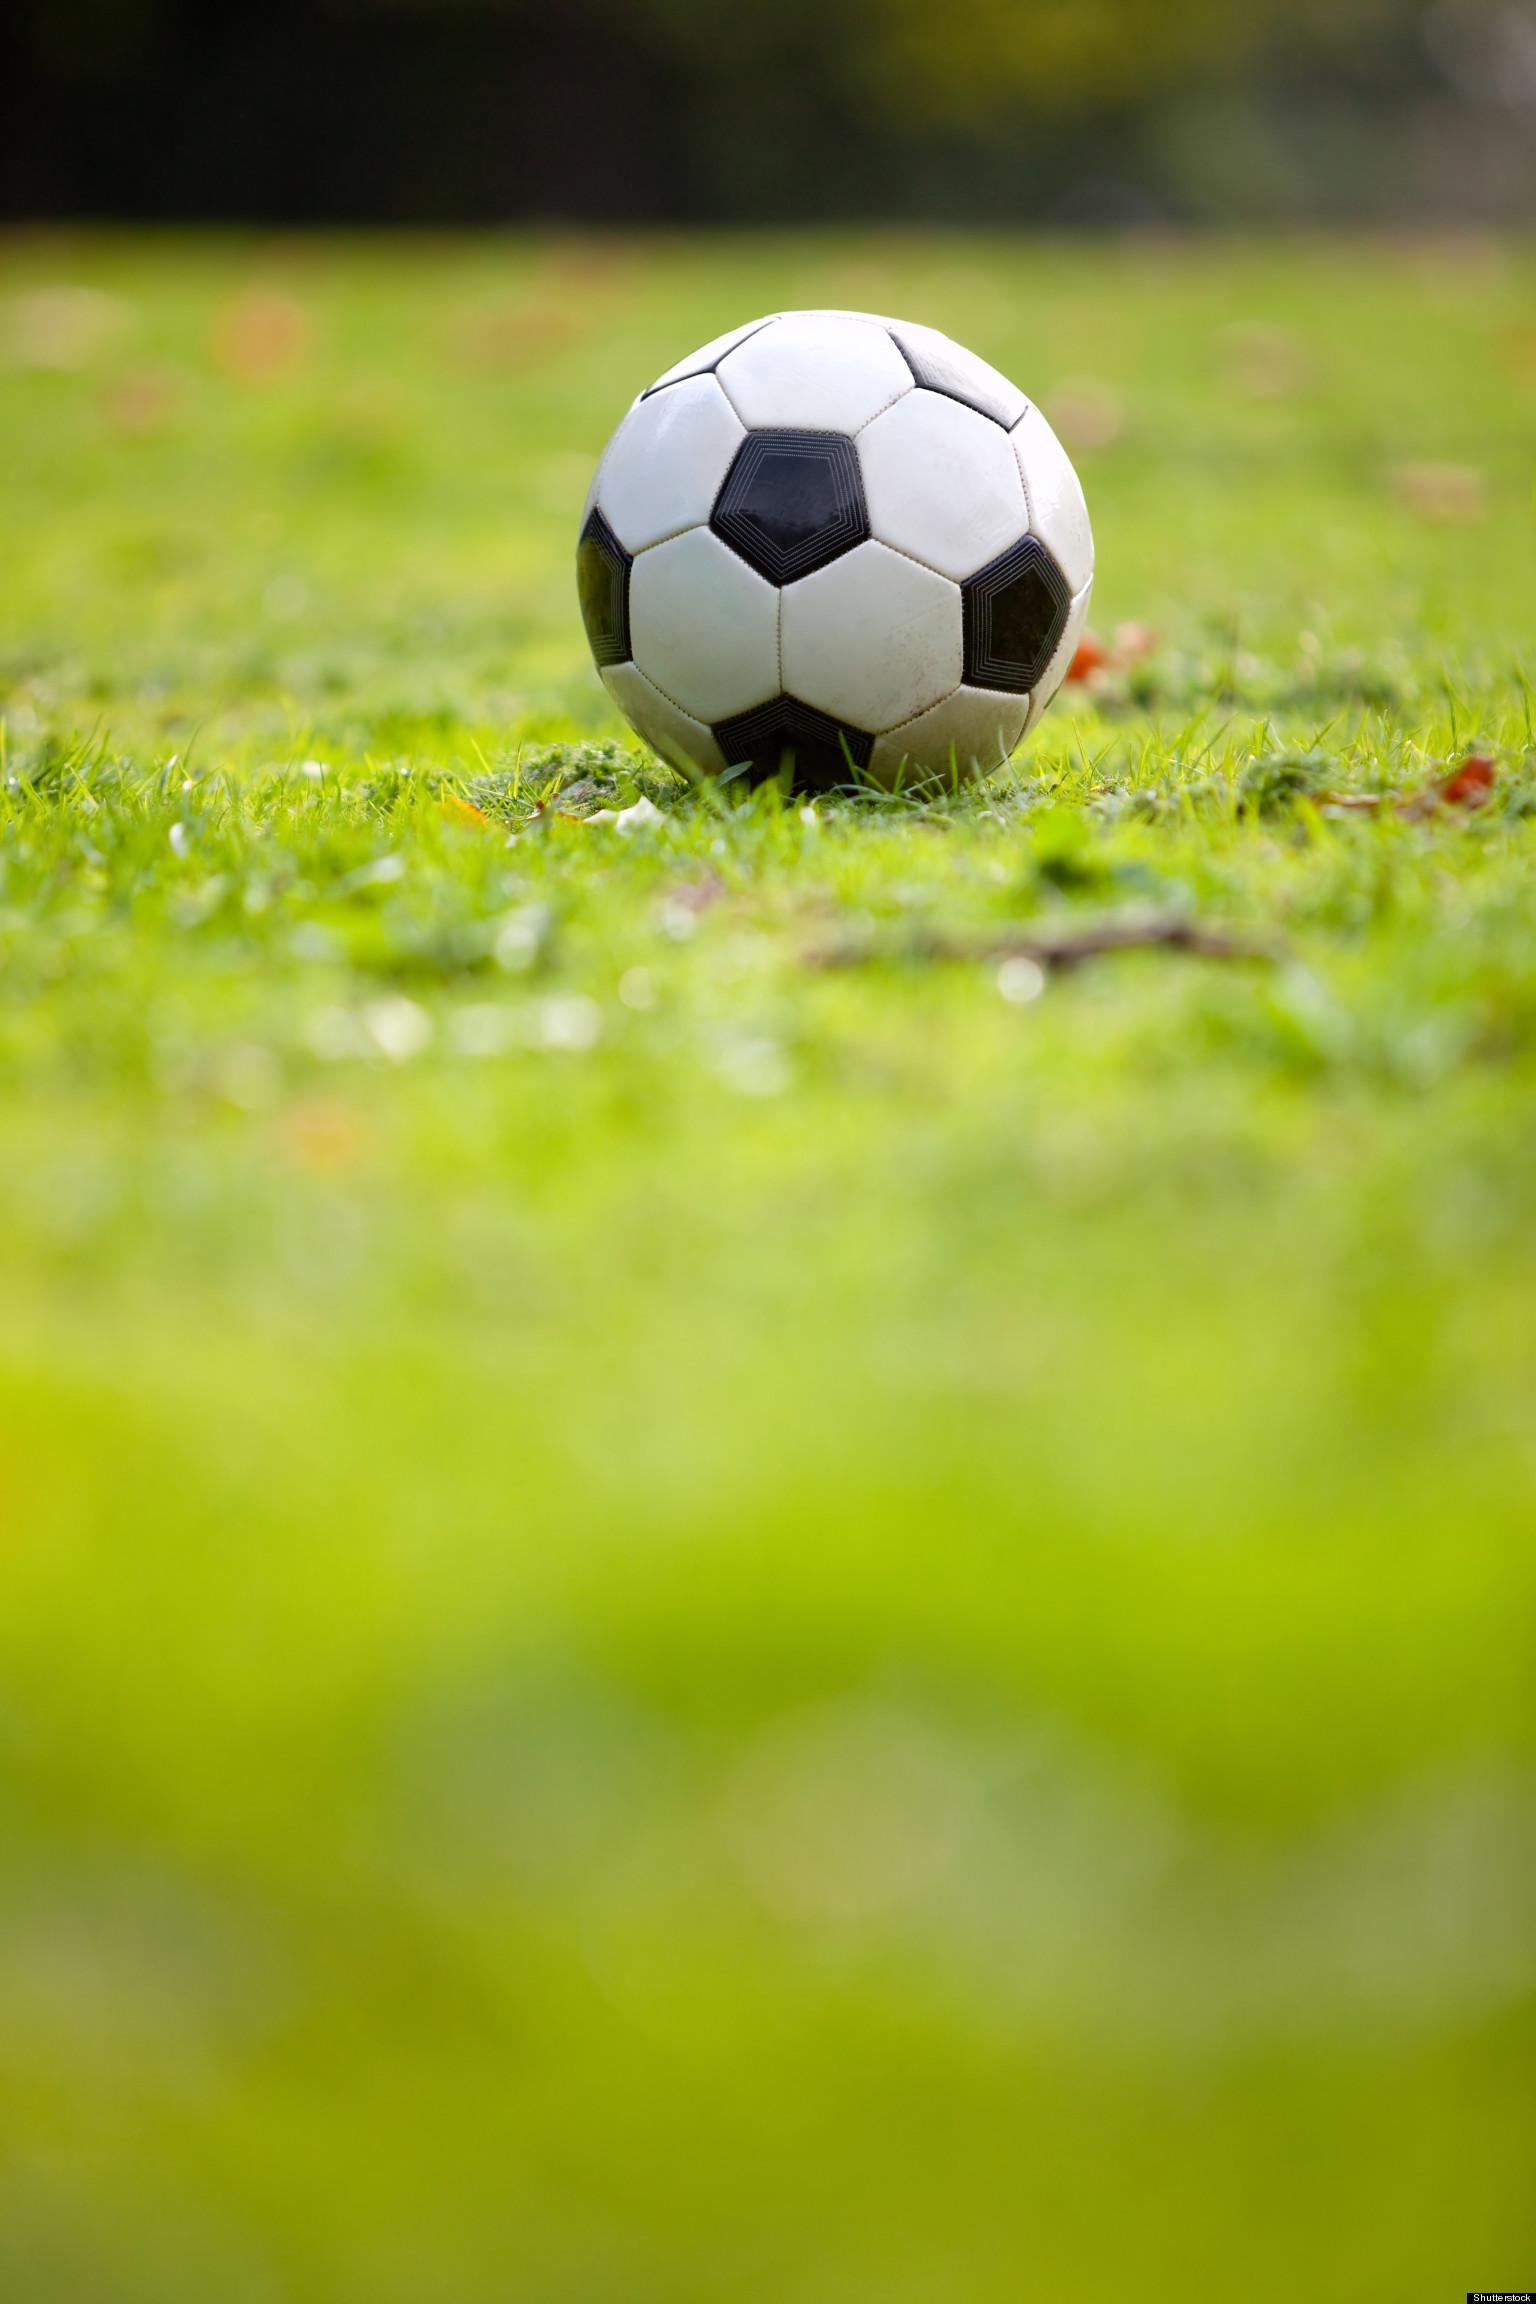 Dribbling Soccer Ball Dribbling Soccer Ball to